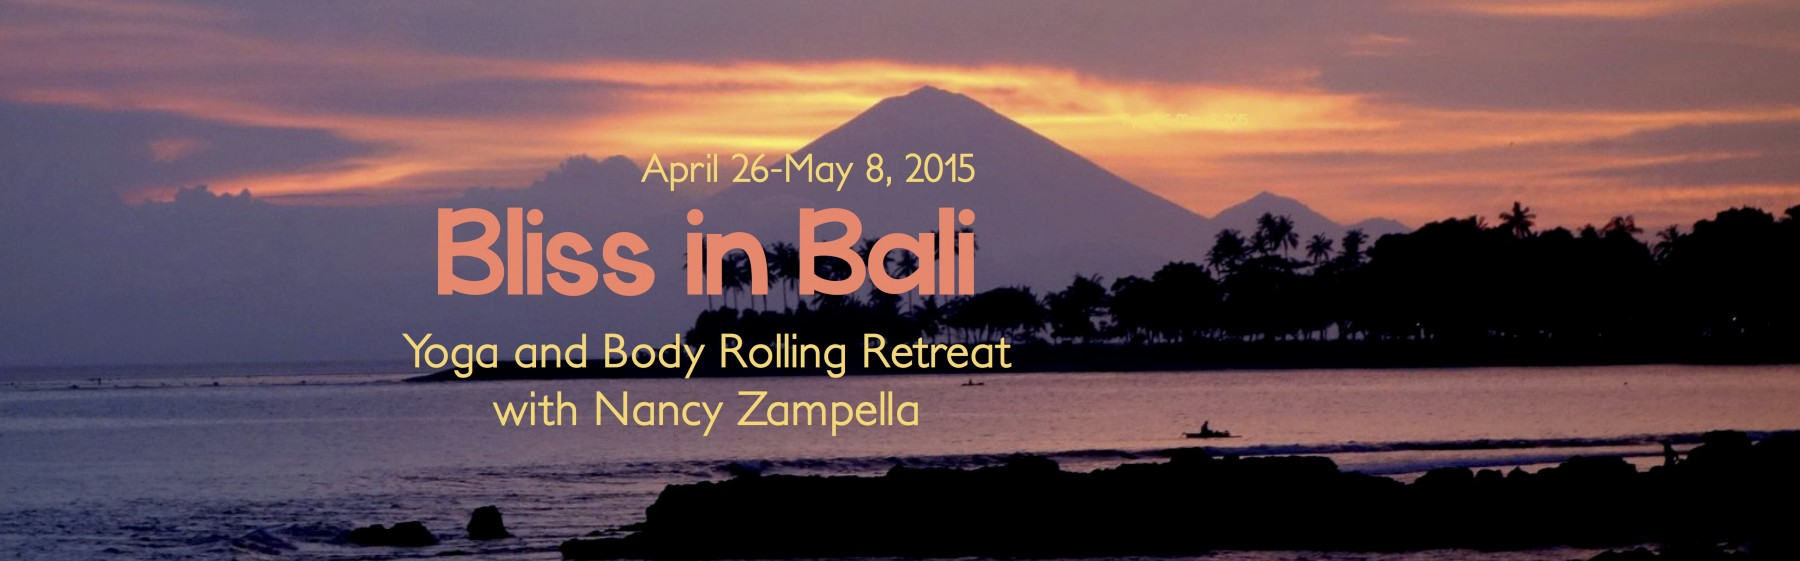 yoga retreat in bali and lombok